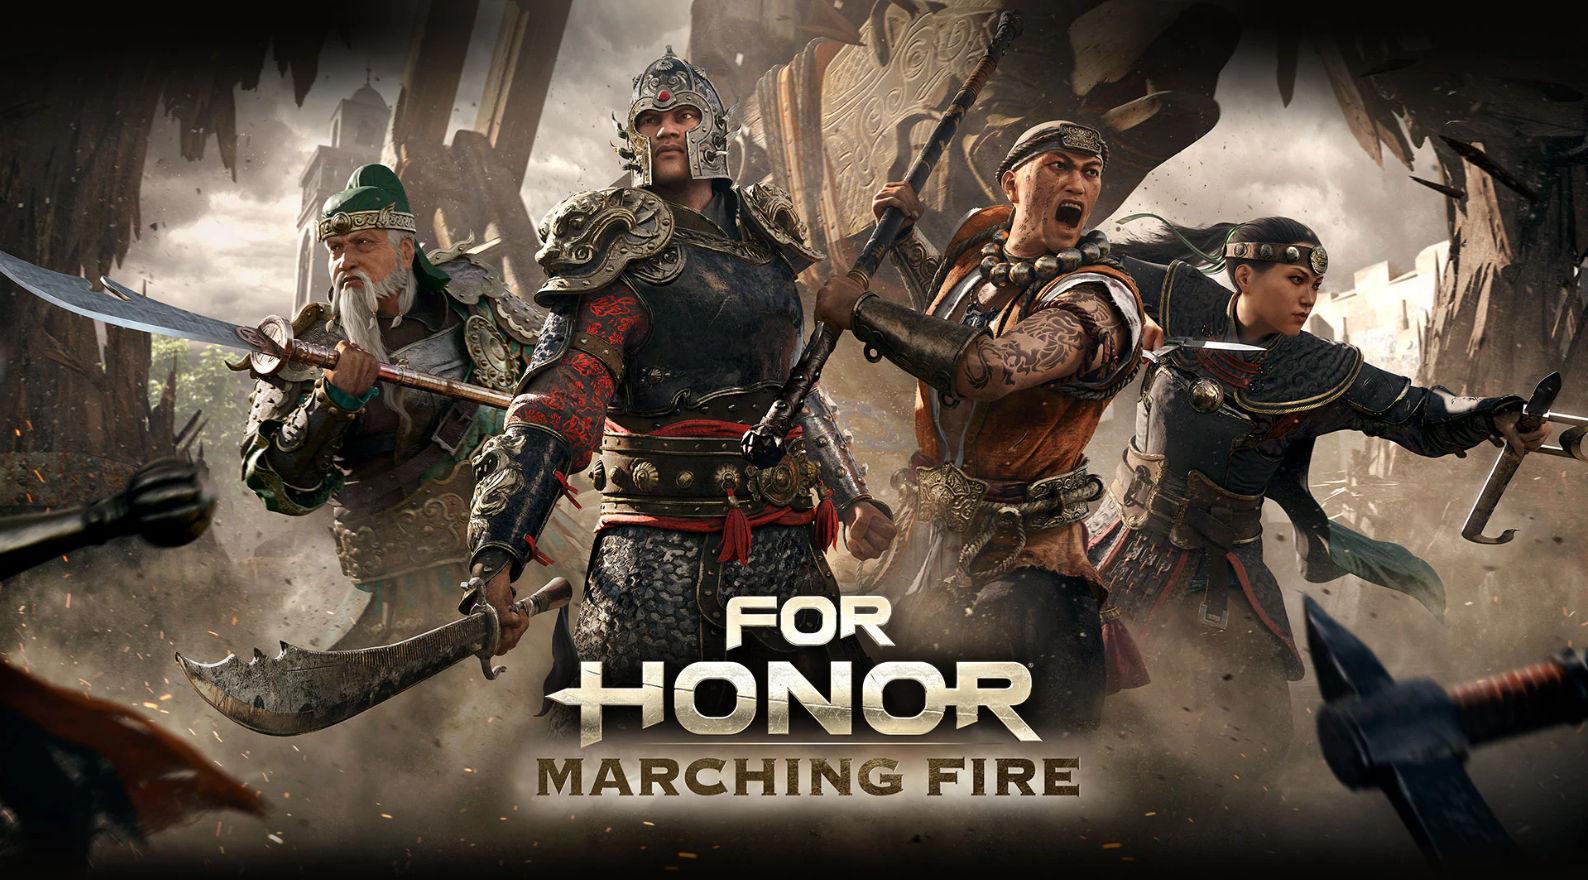 Фотография z for honor - marching fire edition (uplay) ru/cis